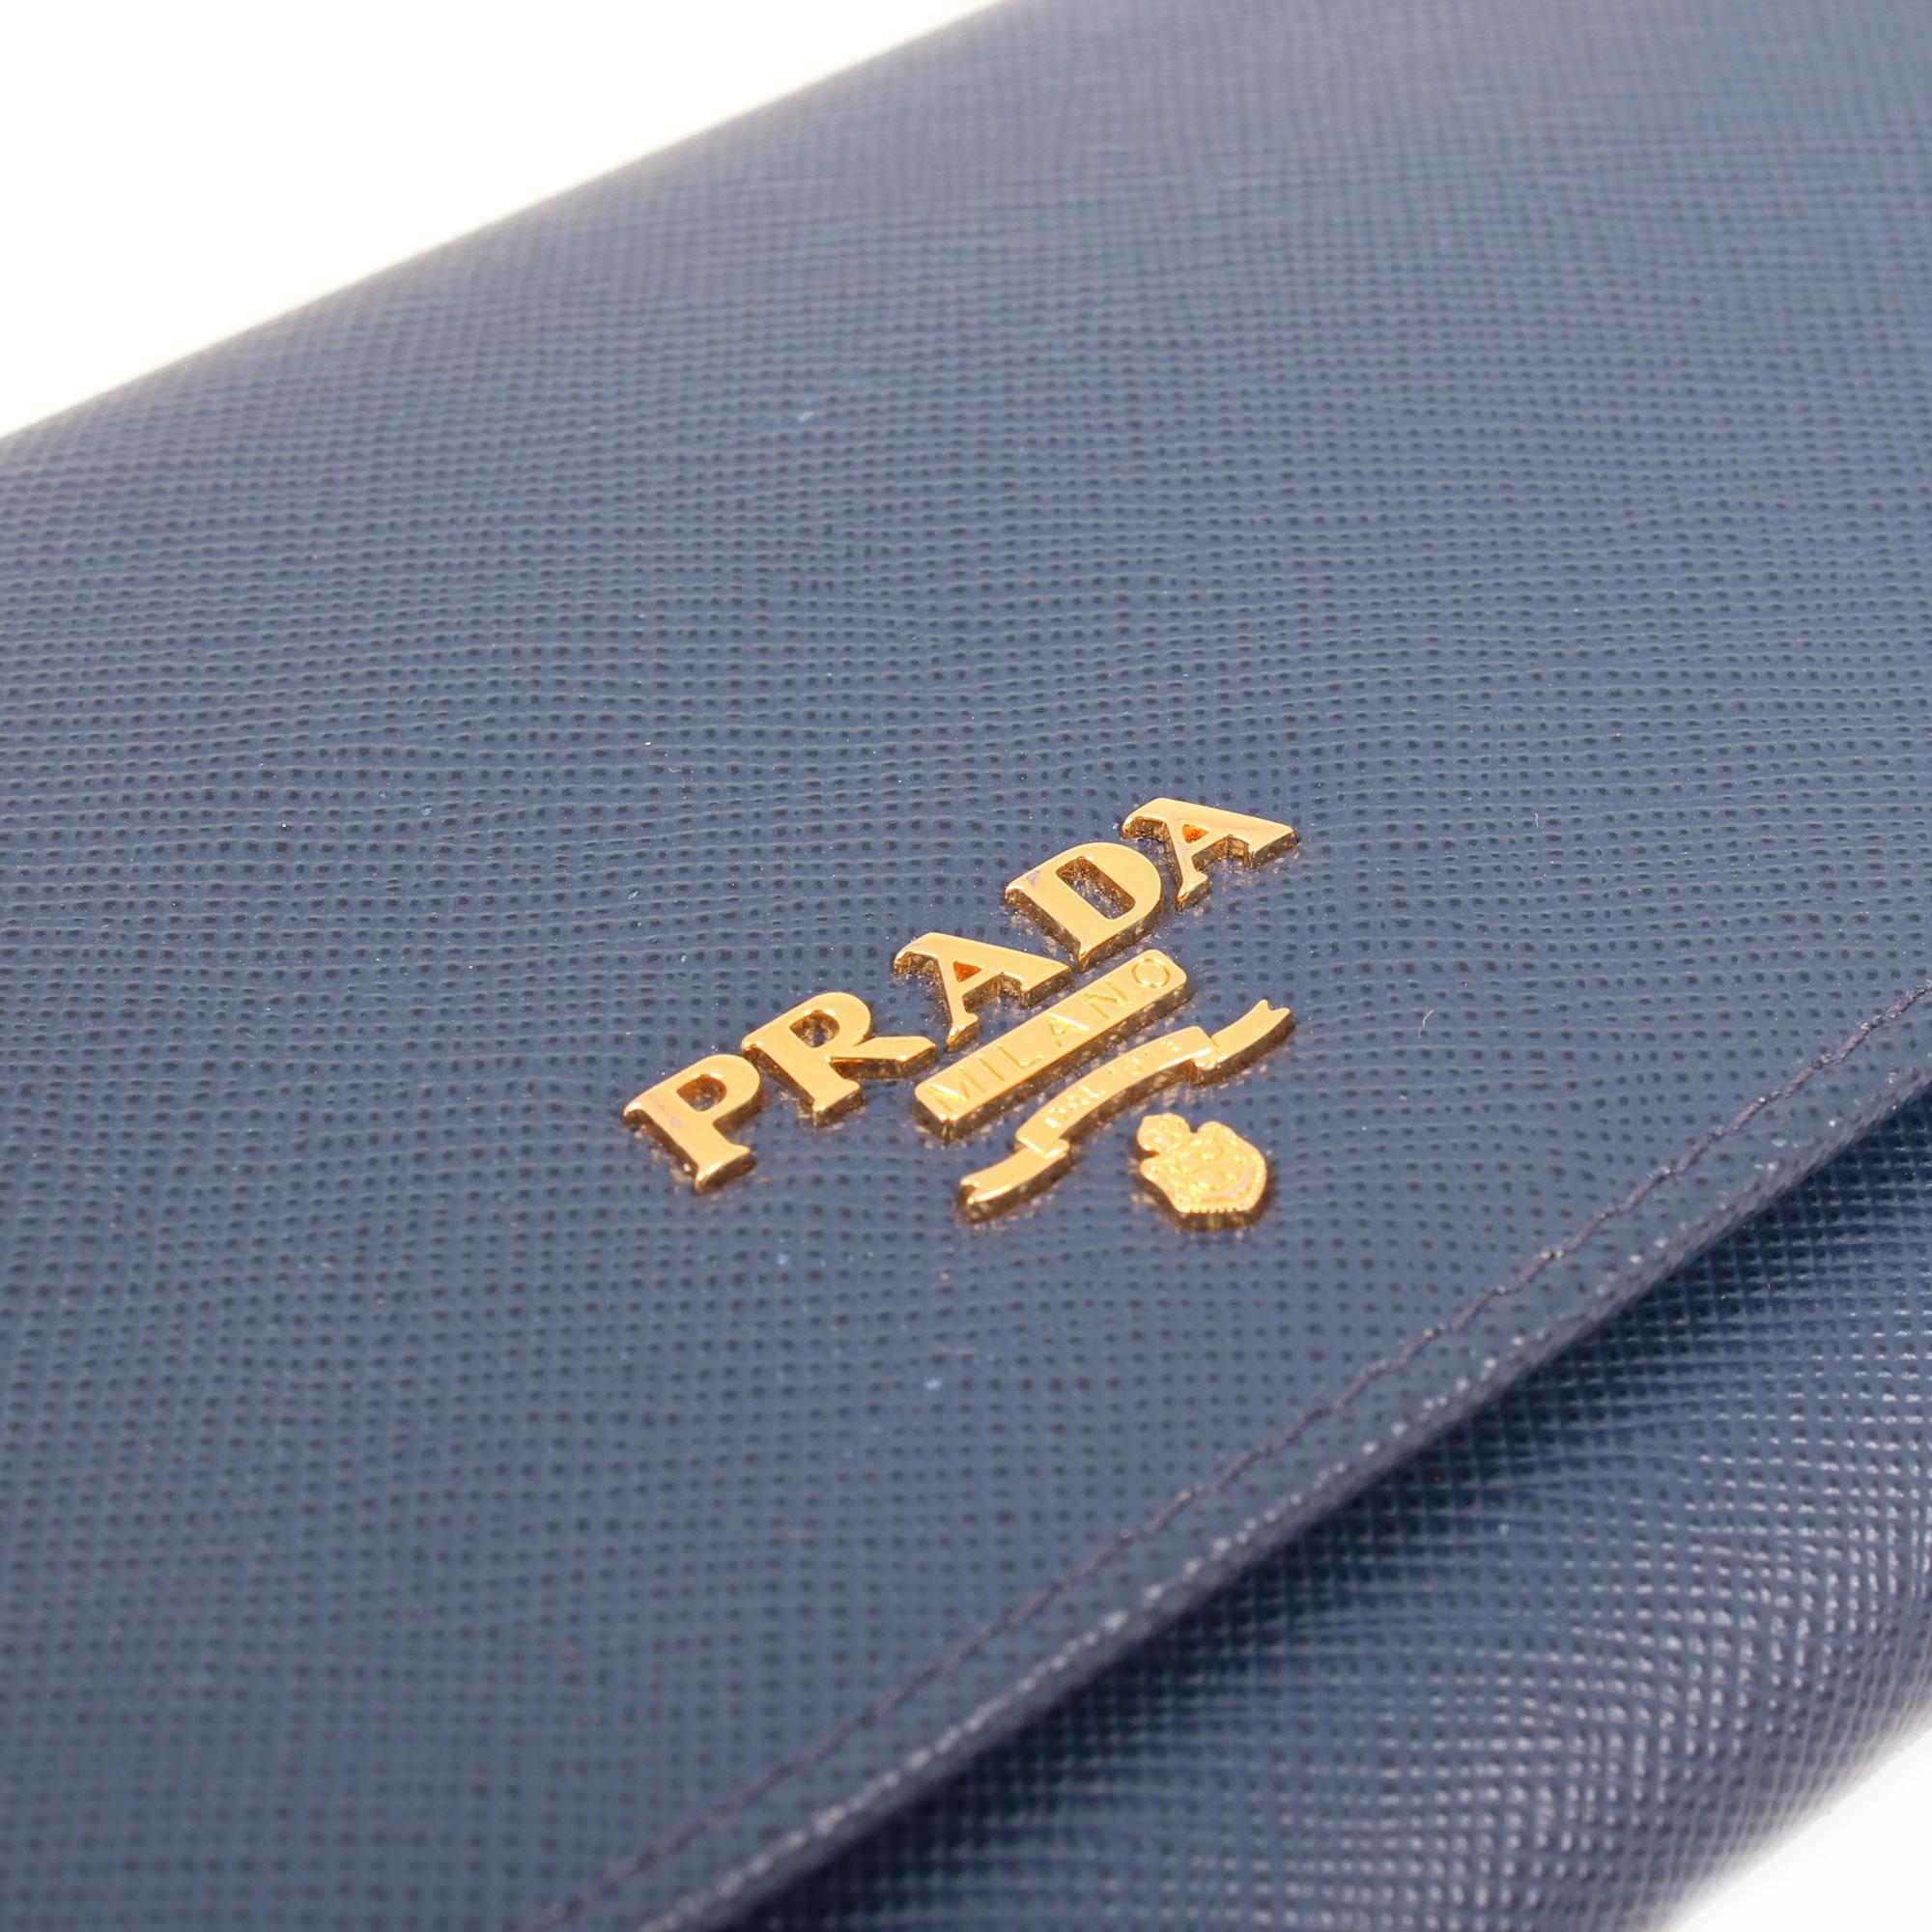 bolso-prada-wallet-on-chain-saffiano-metal-bluette-blue-logo